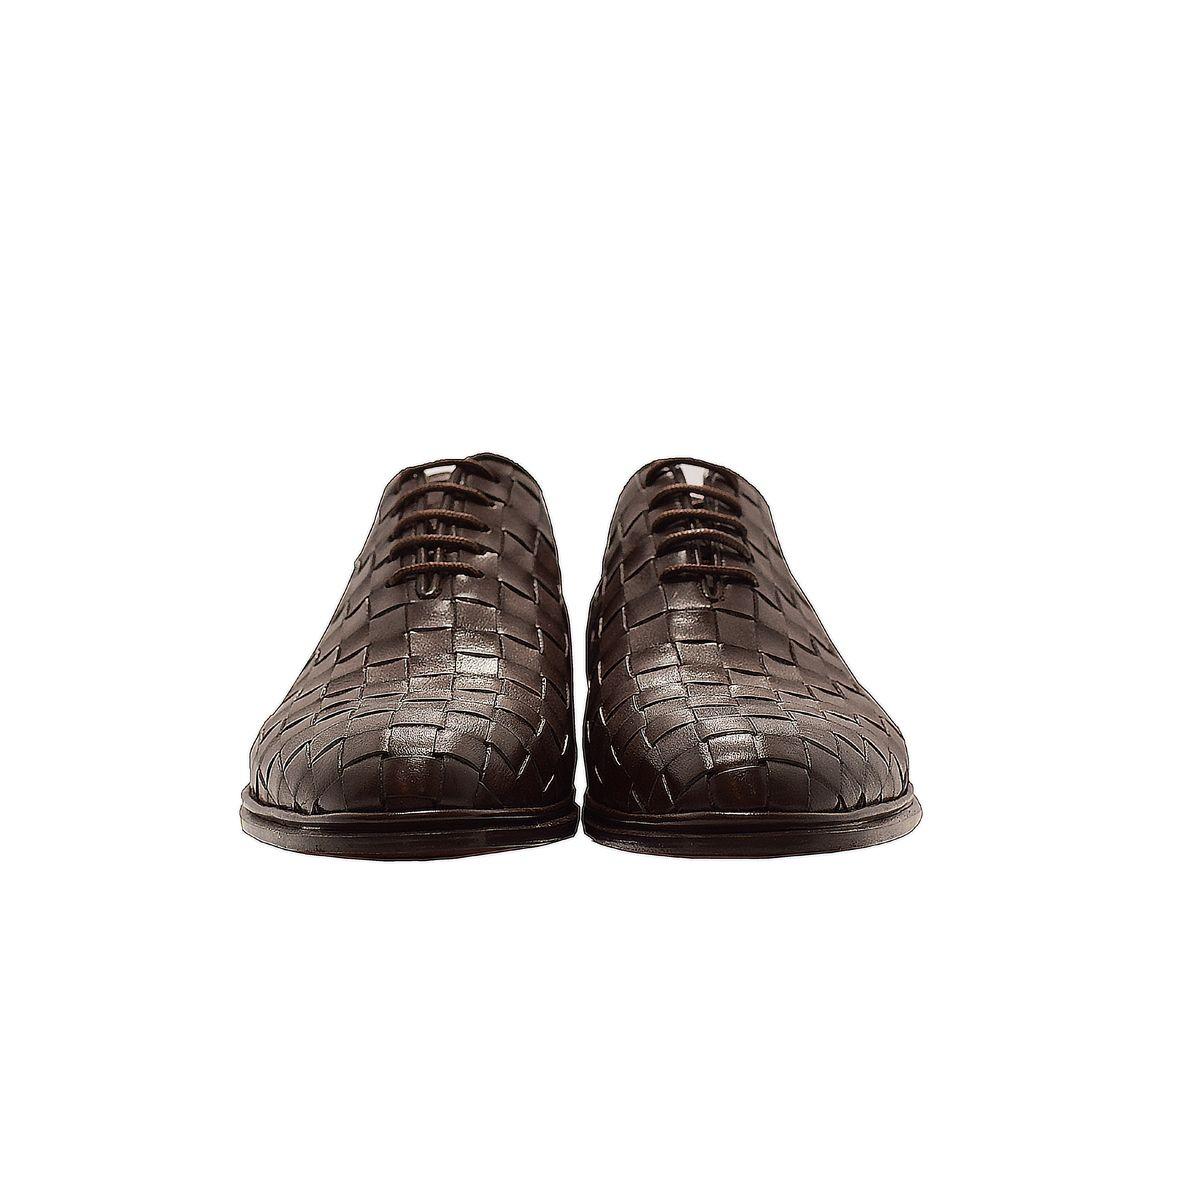 کفش مردانه دگرمان مدل بوریا کد deg.2br2102 -  - 7